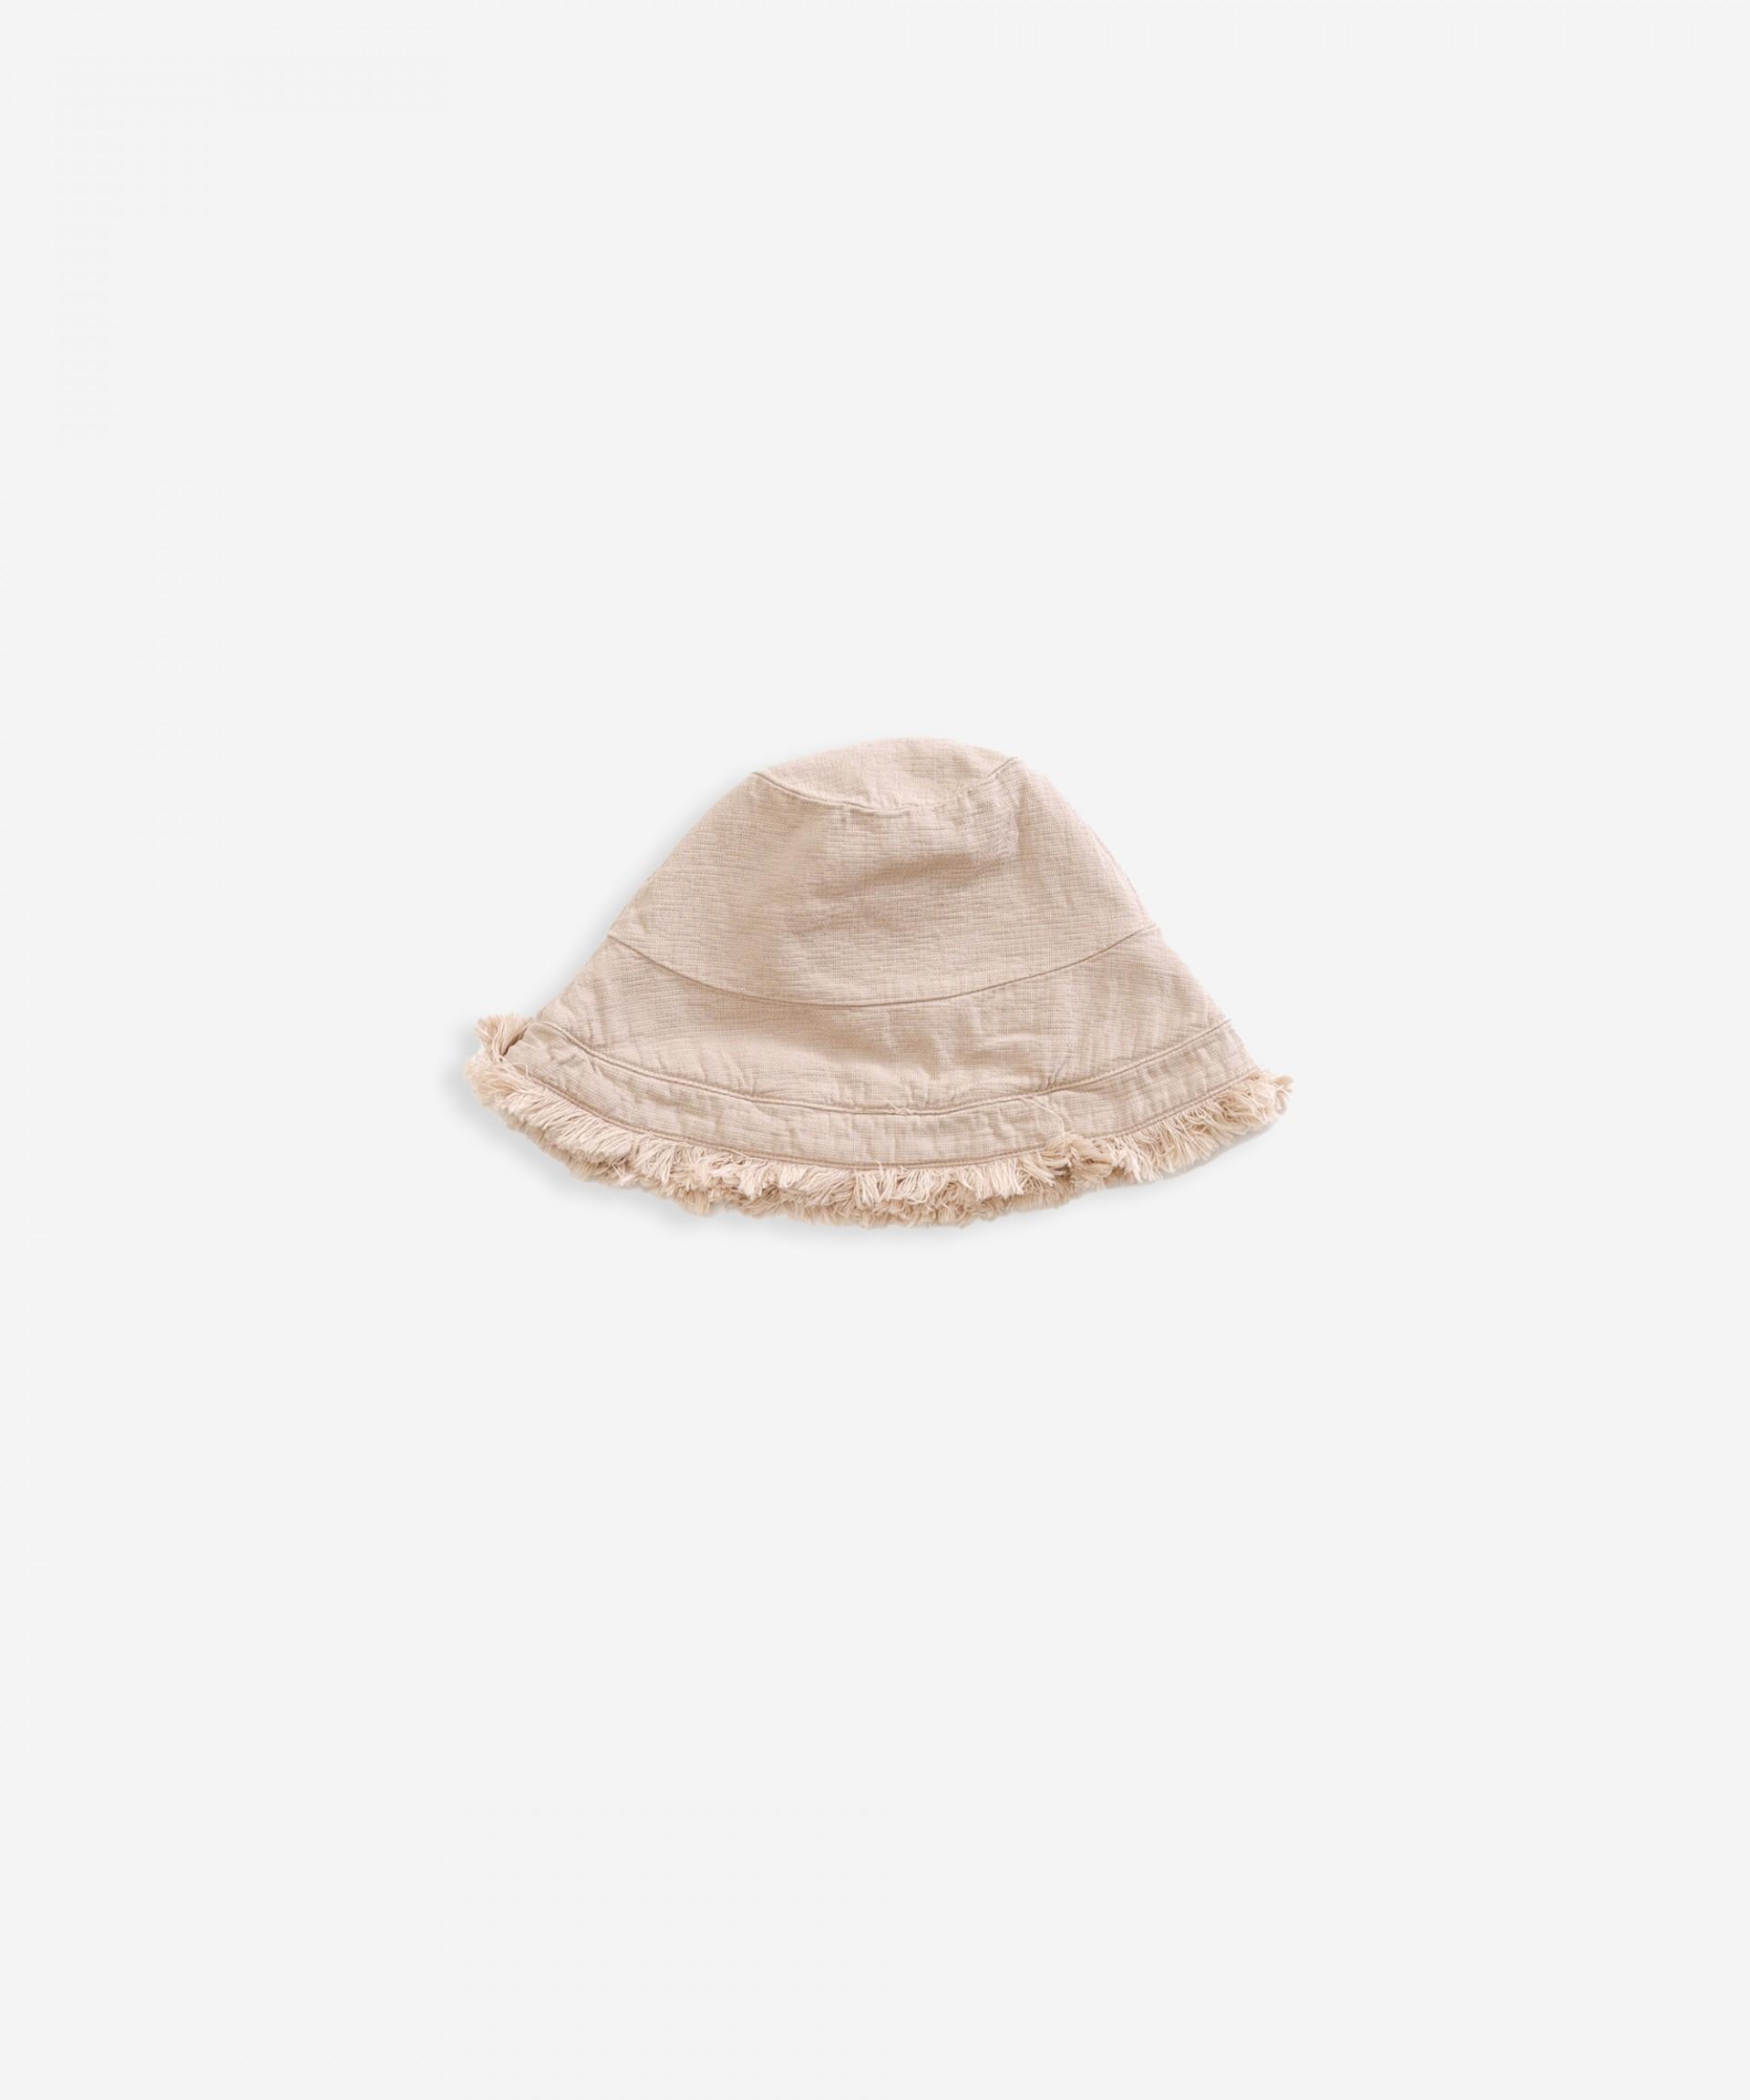 Sombrero de lino | Weaving